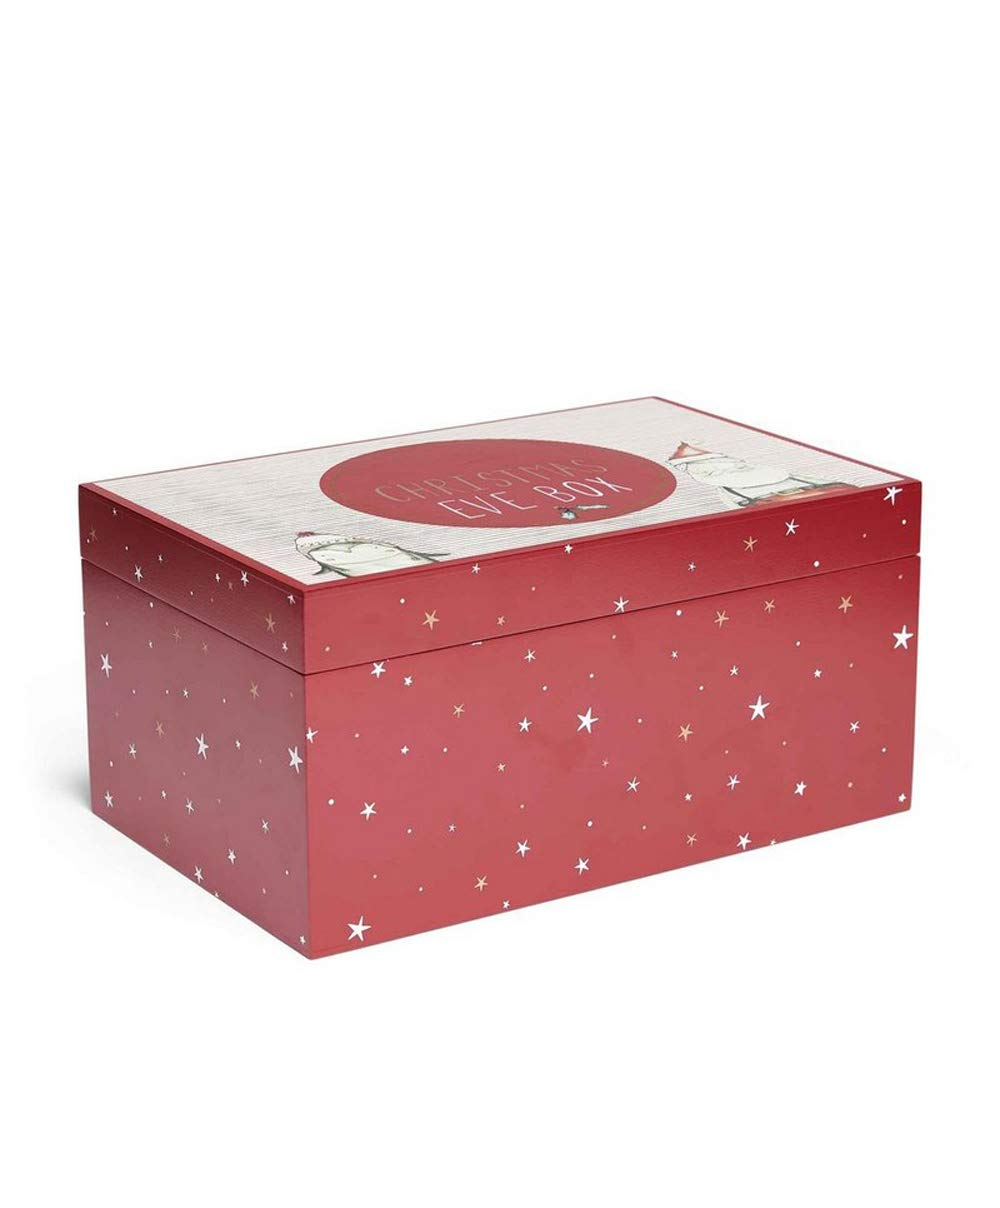 Mamas & Papas Luxury Red Wooden Painted Christmas Eve Gift Keepsake Box Katies Playpen® - Baby Best Buys